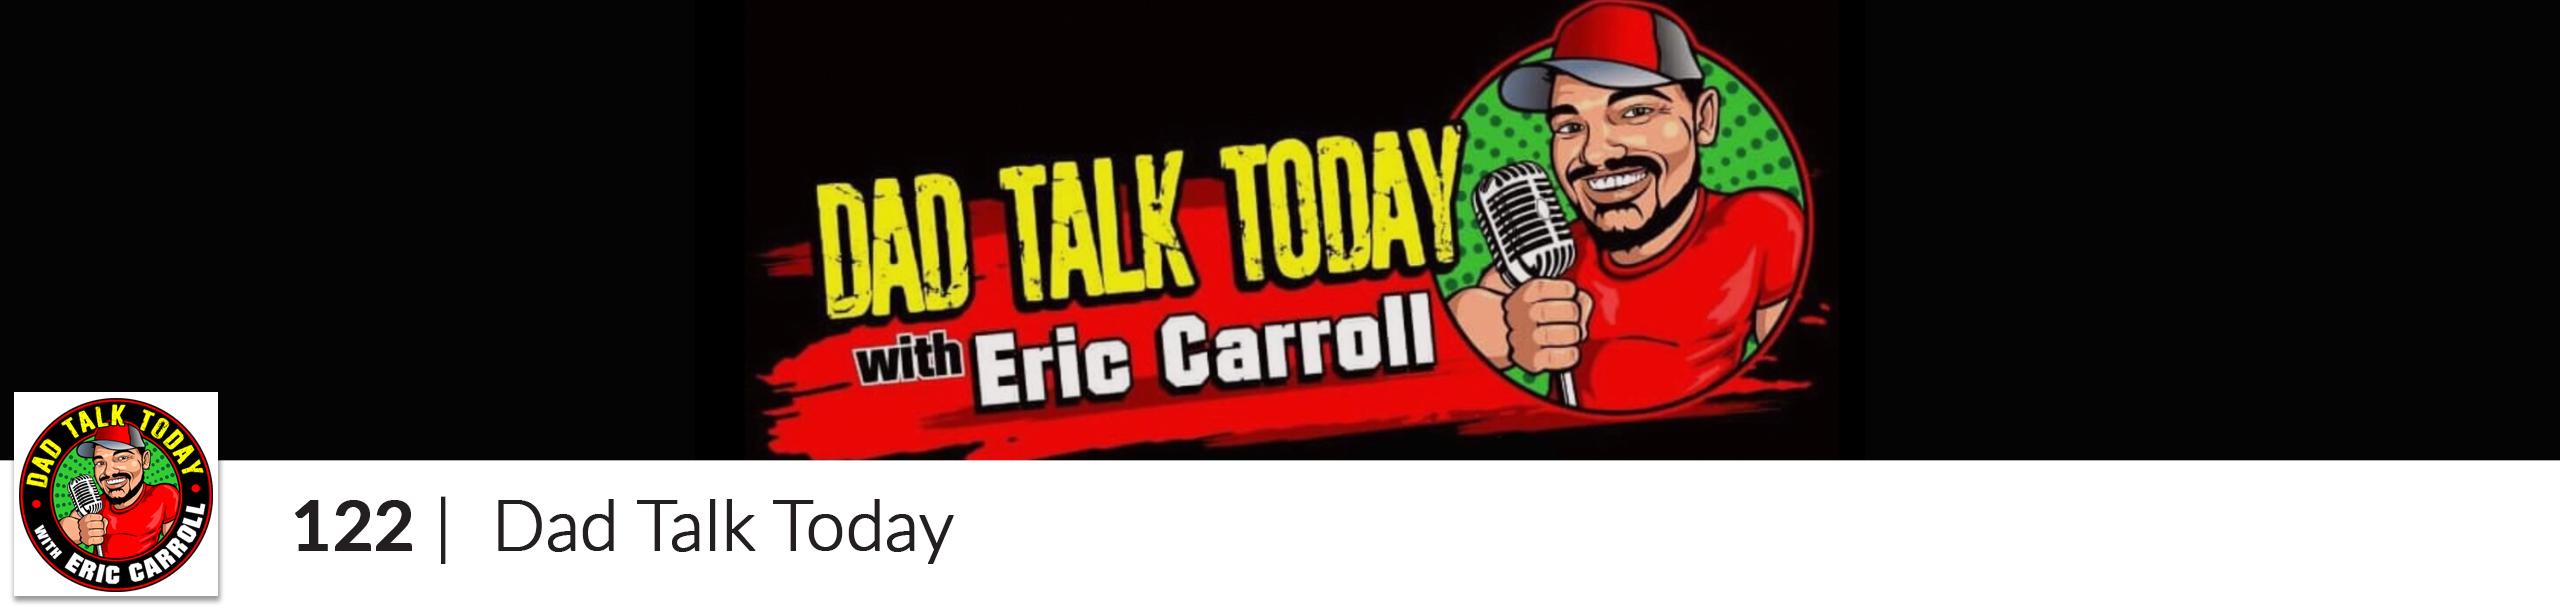 dad_talk_today-header